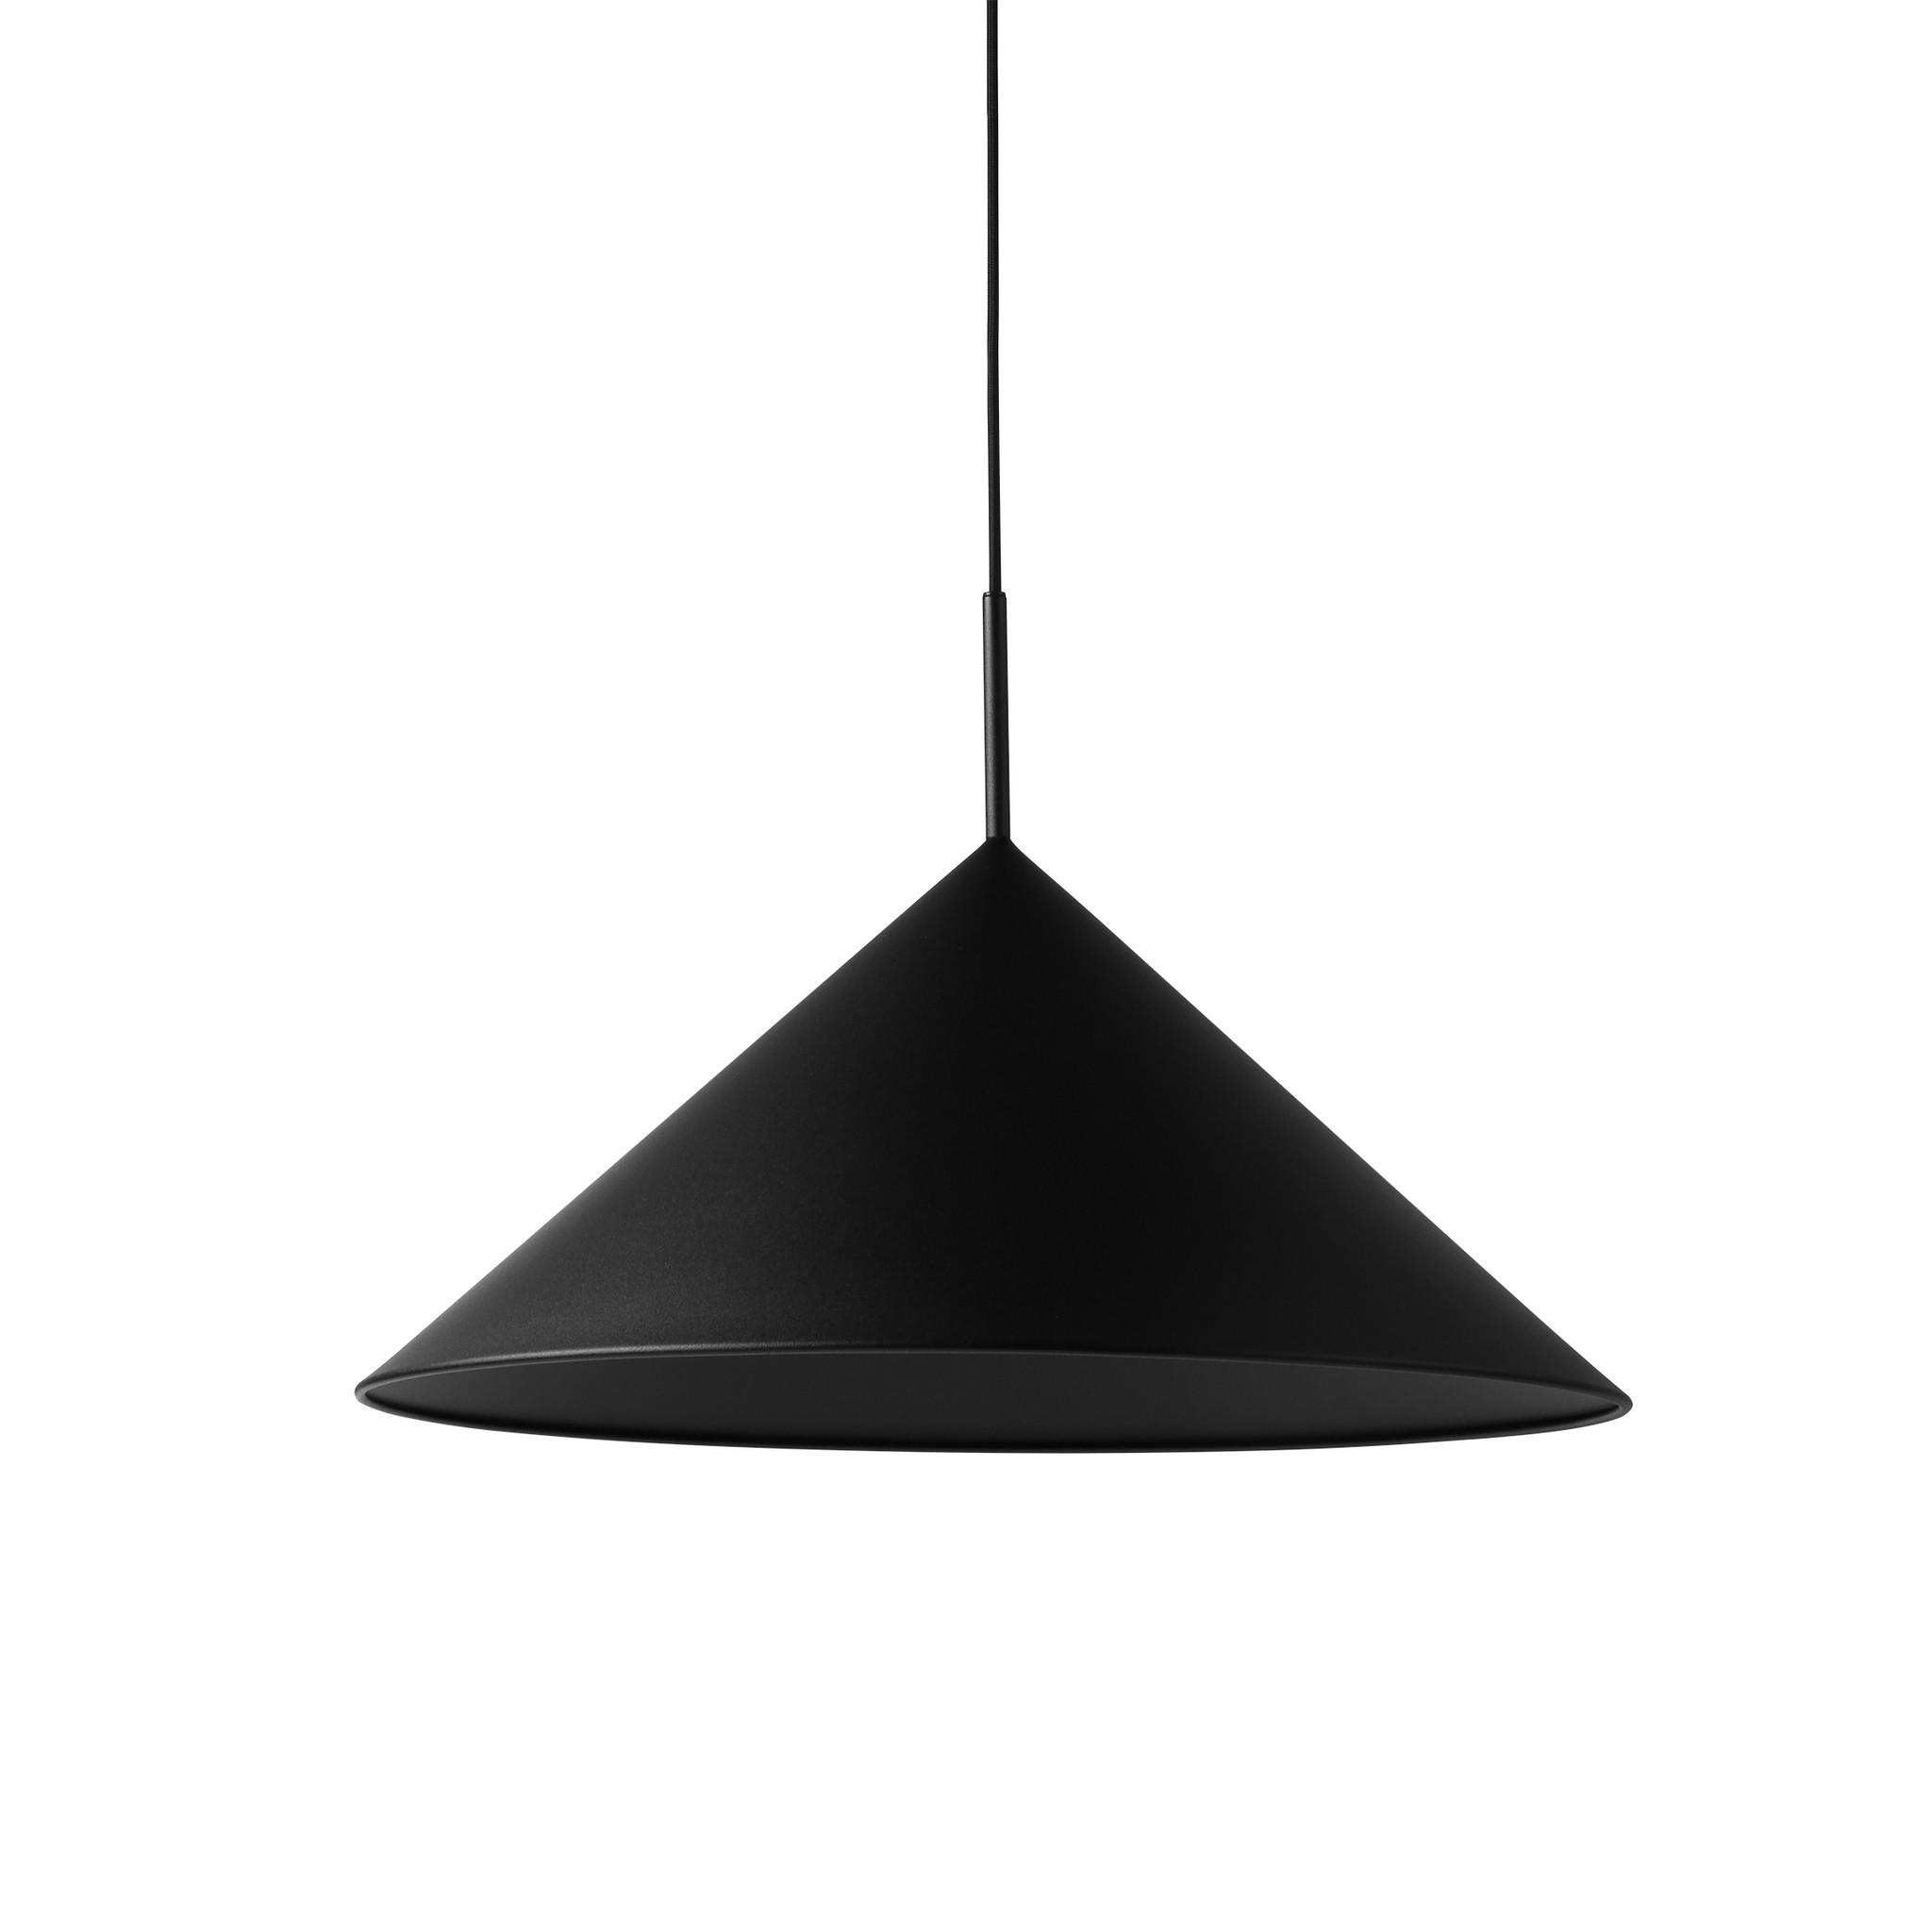 HK Living Lámpara Colgante triángulo - metal negro mate - Ø60x39cm - HK Living